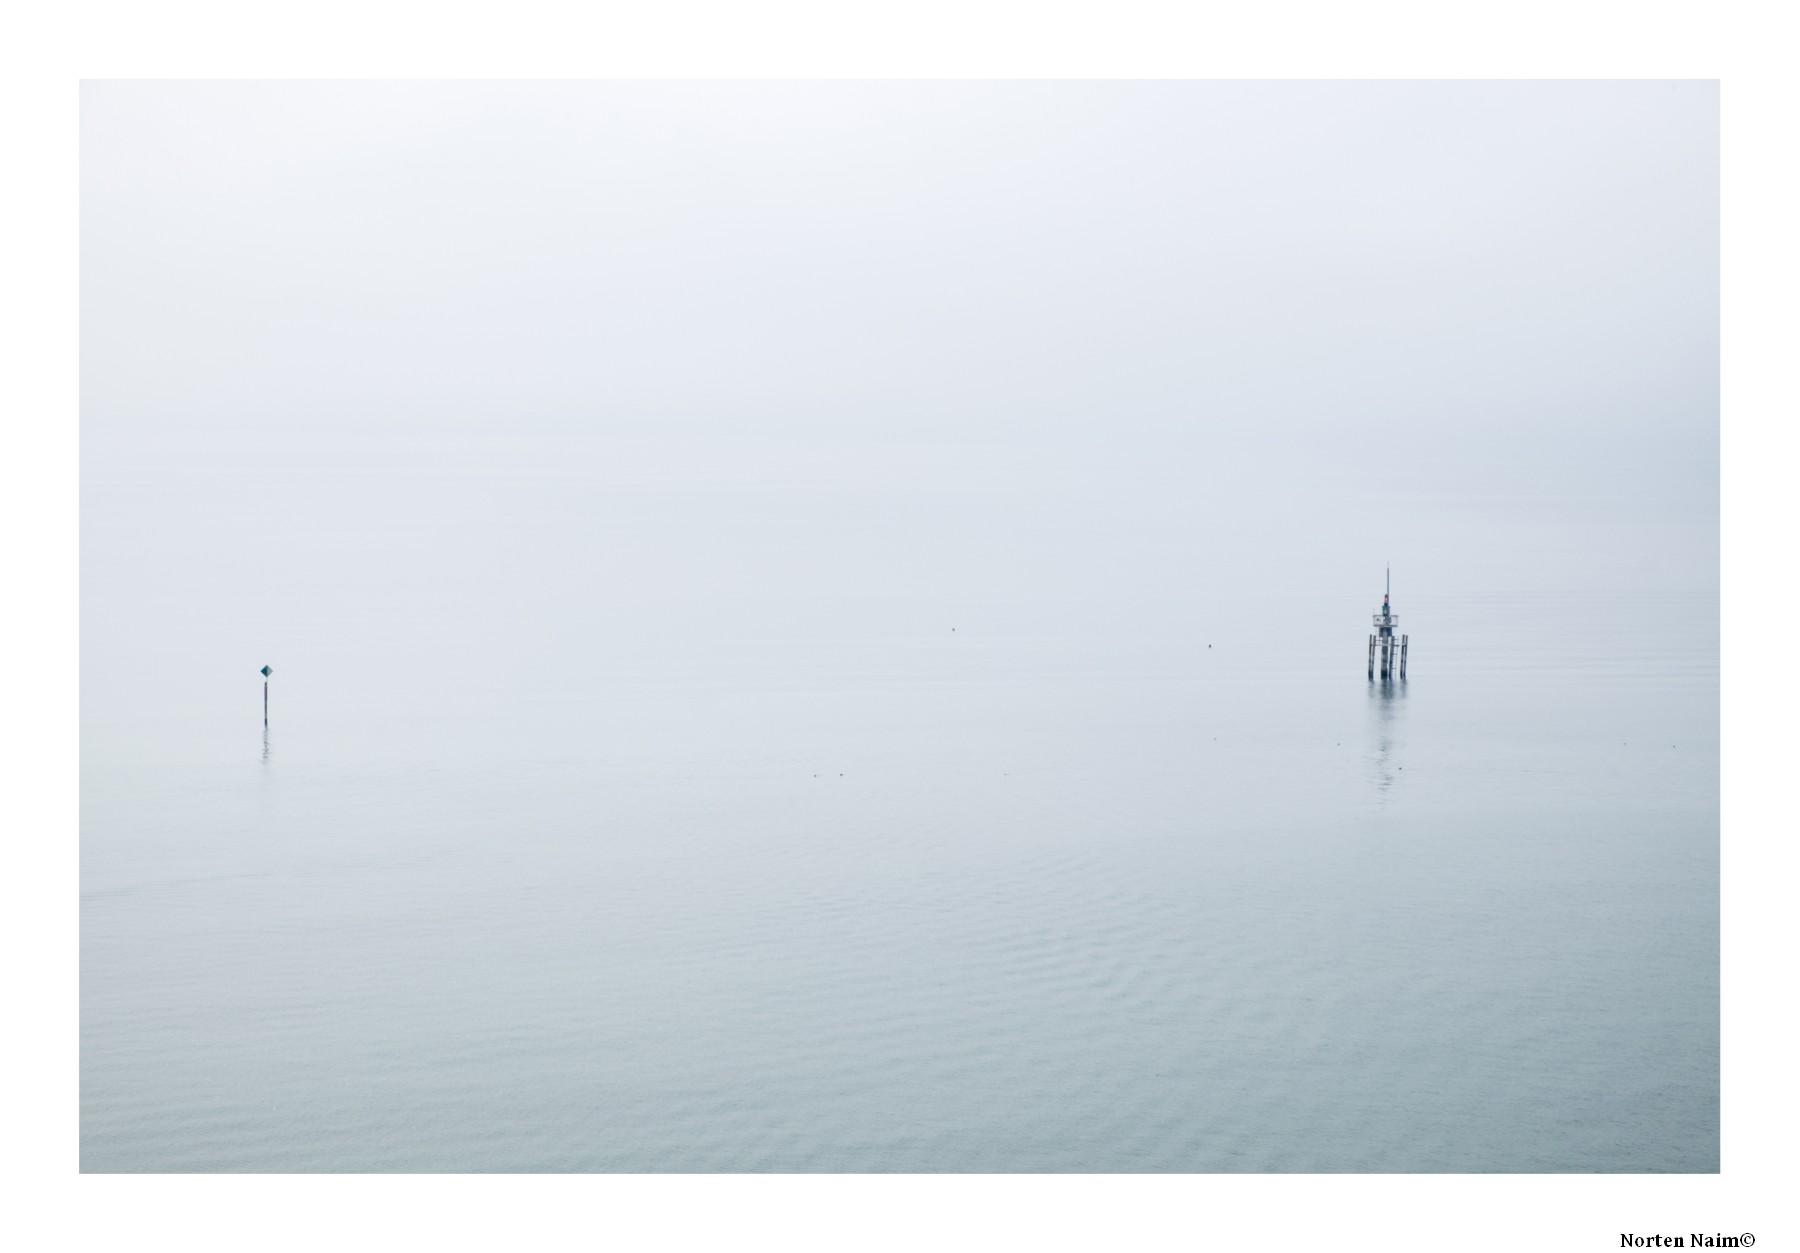 Signale im Bodensee III